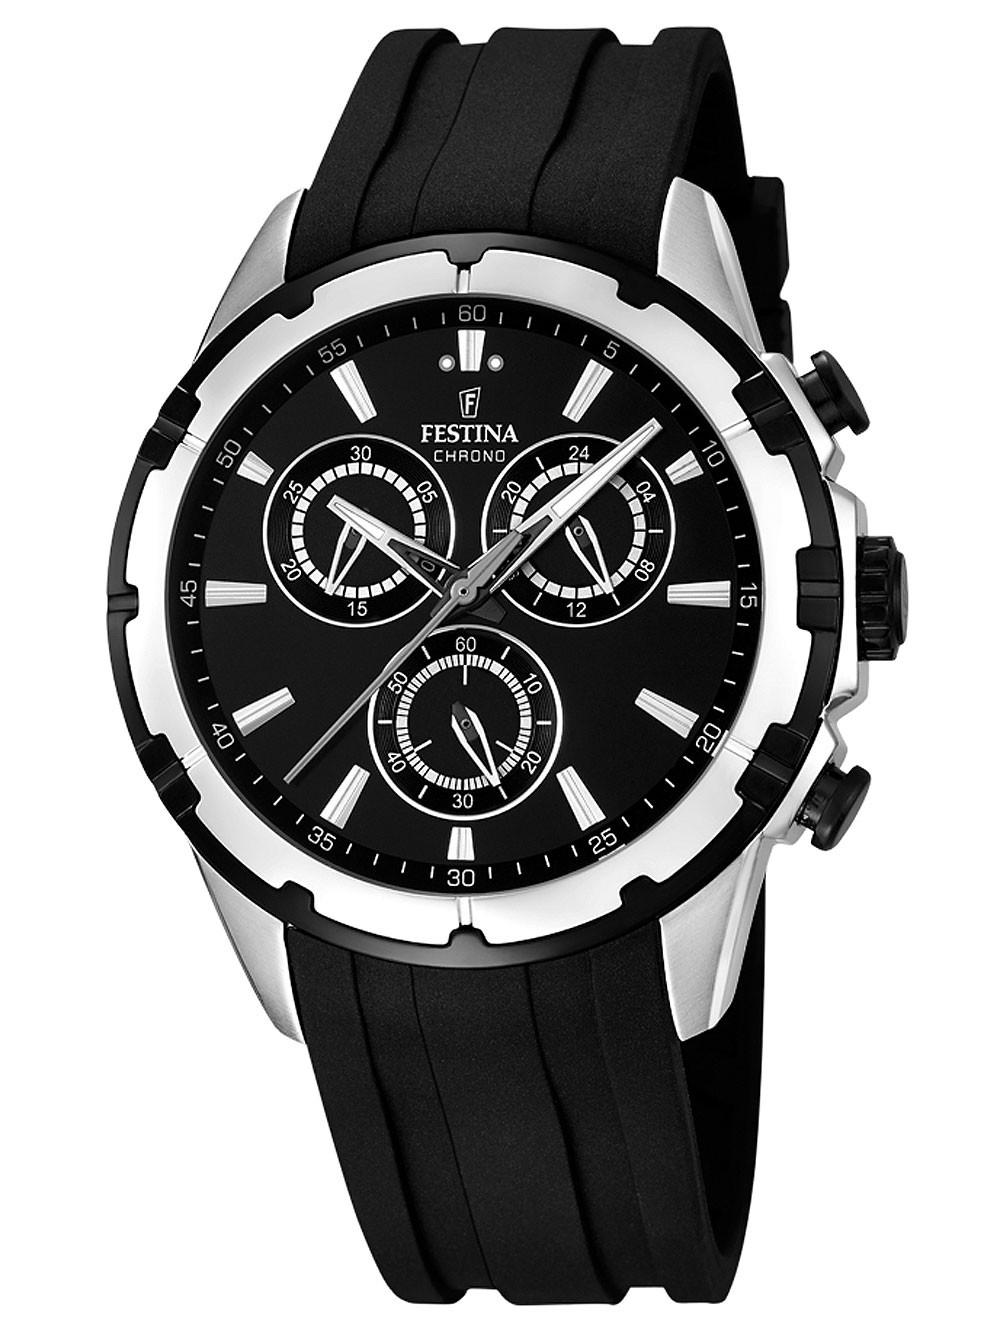 watches chrono12 festina f16838 2 chronograph 44mm 10atm. Black Bedroom Furniture Sets. Home Design Ideas